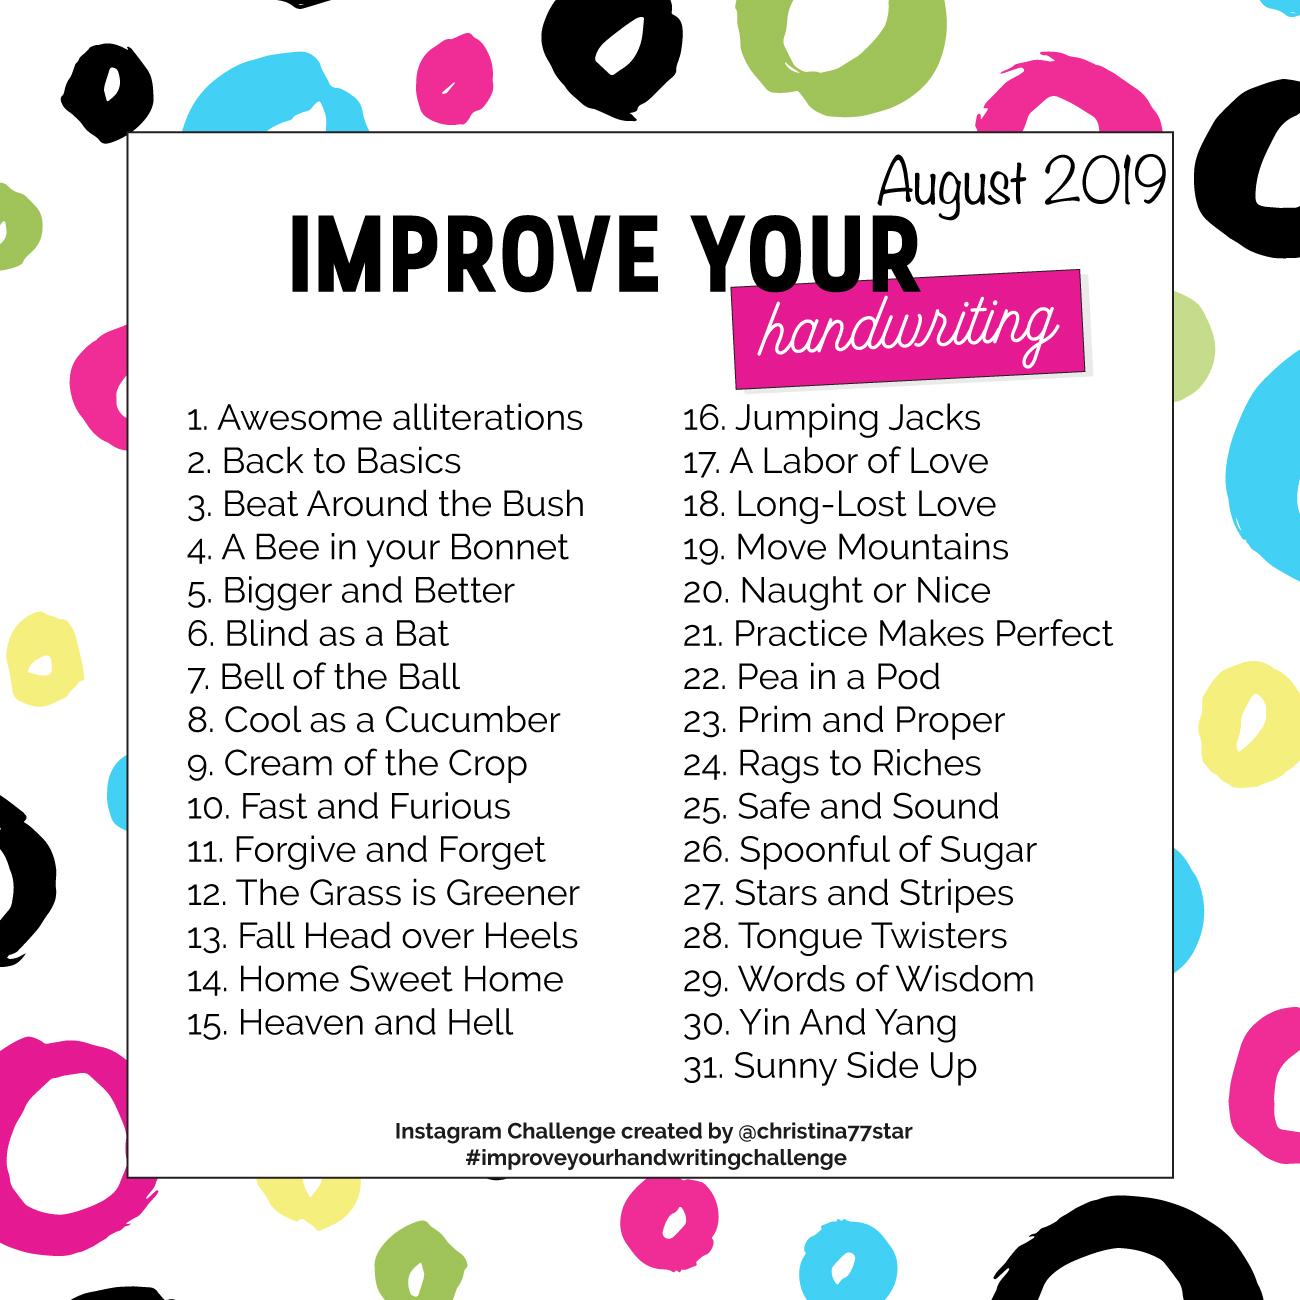 Improve Your Handwriting Challenge - August 2019 | christina77star